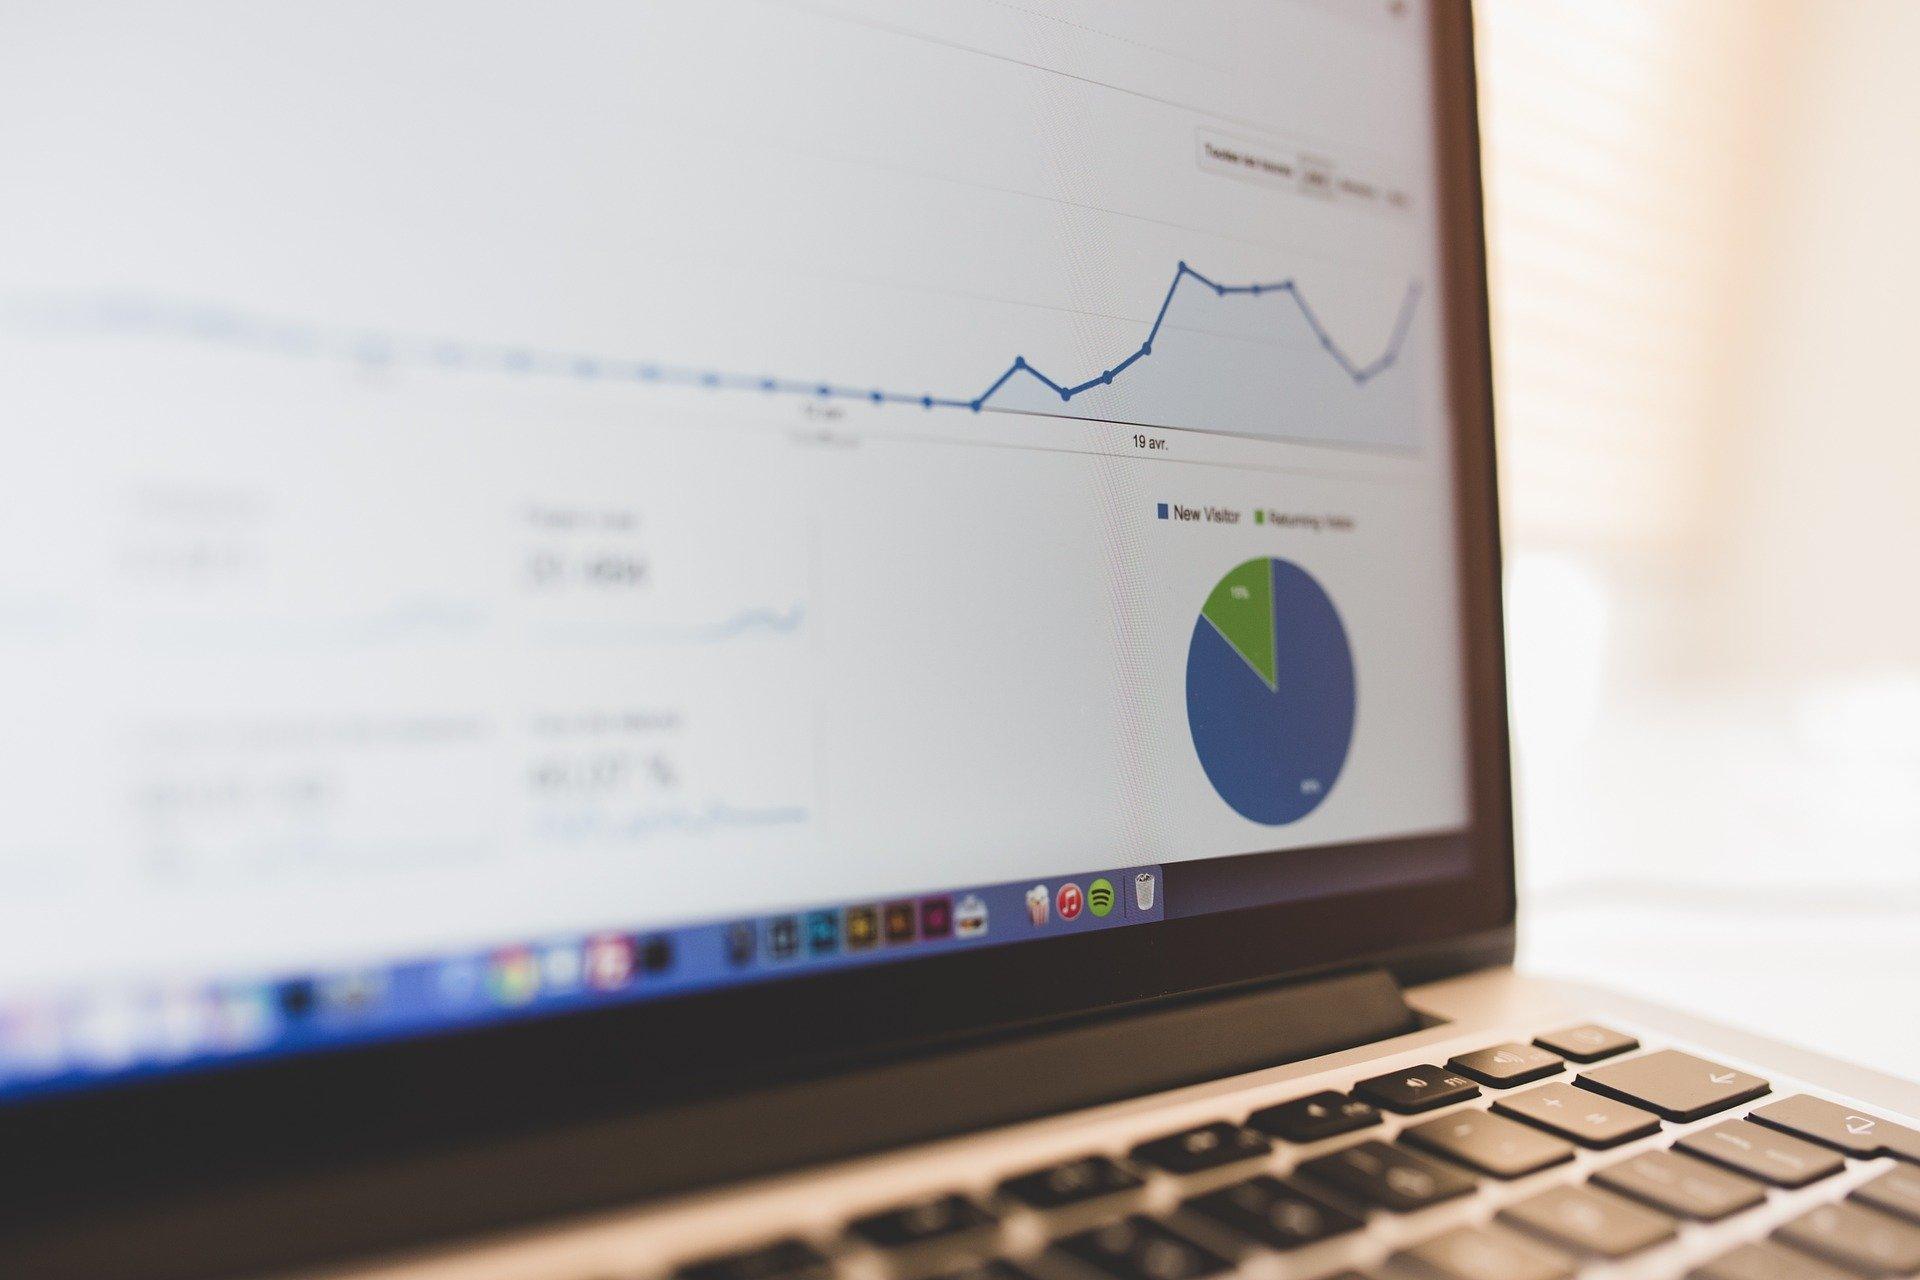 Business tracking analytics